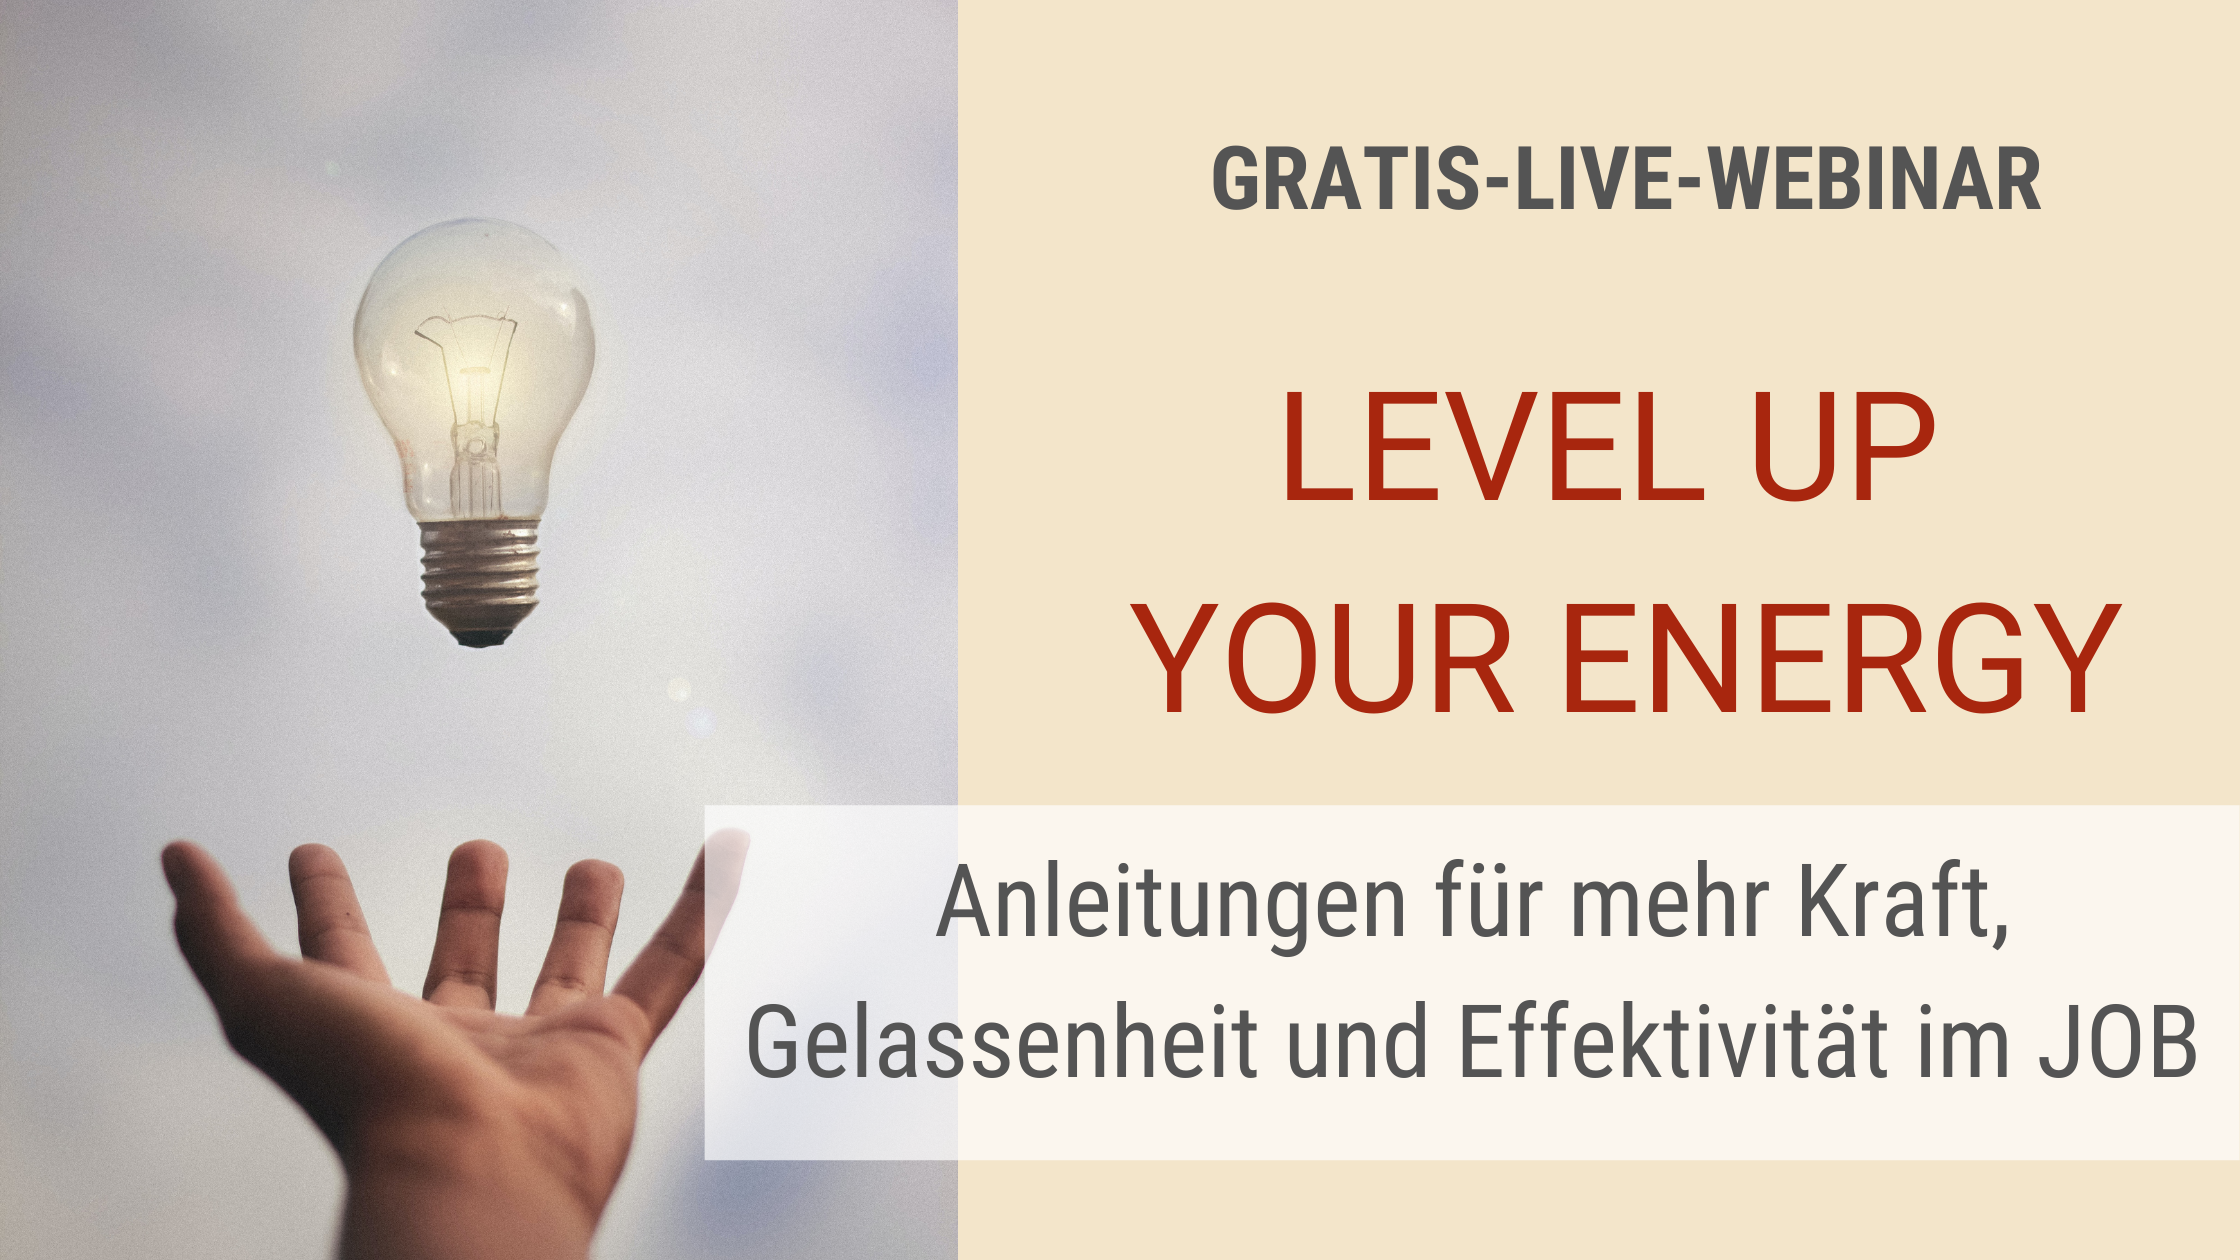 gratis live webinar level up your energy